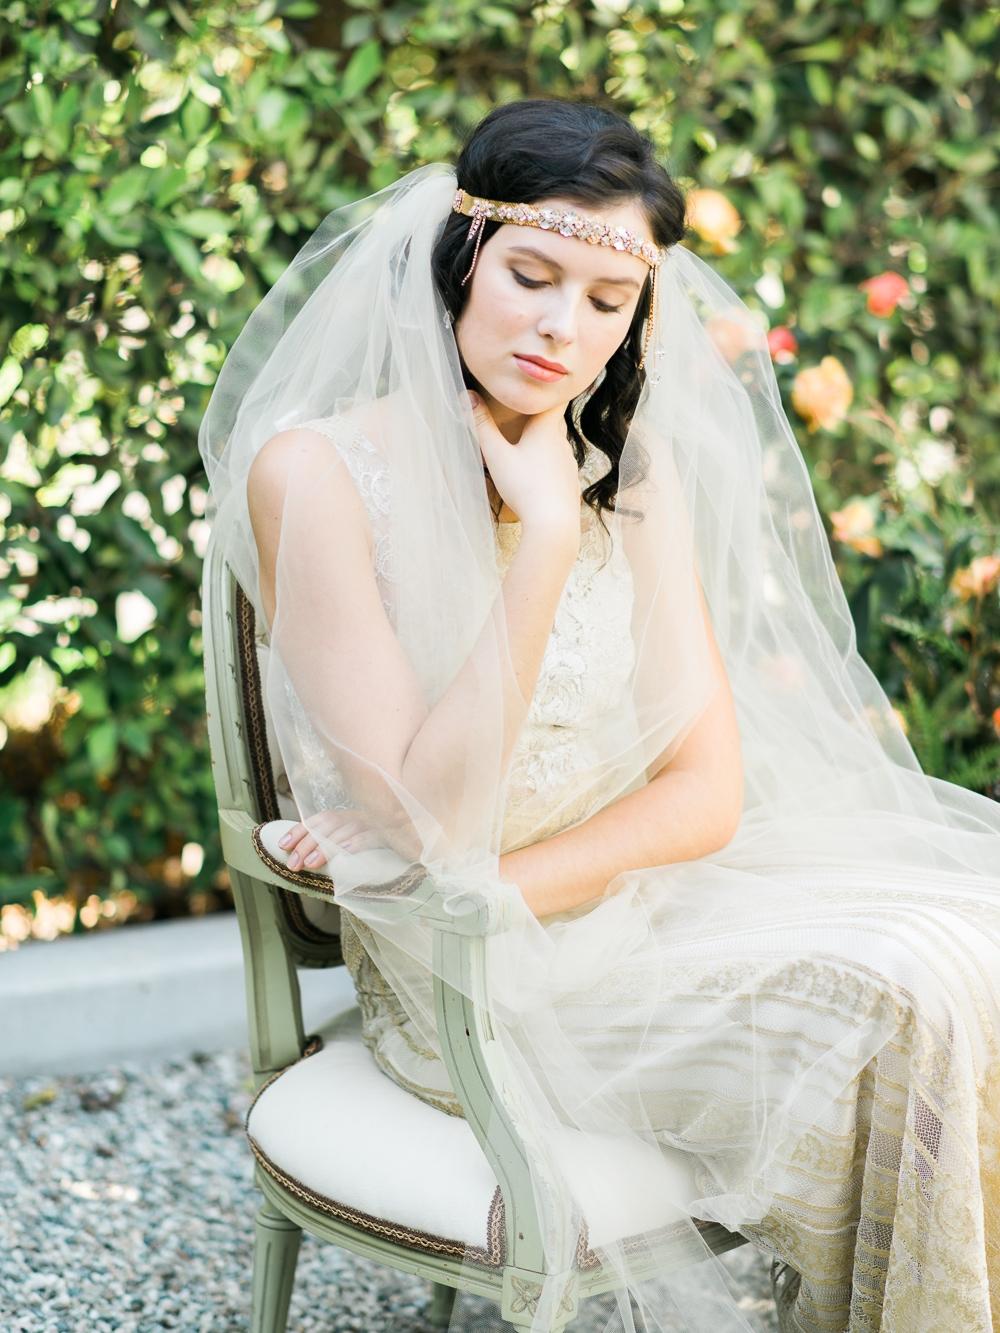 ©-celine-chhuon-Mariage-robes-Claire-Pettibone-gothicangel (13).jpg